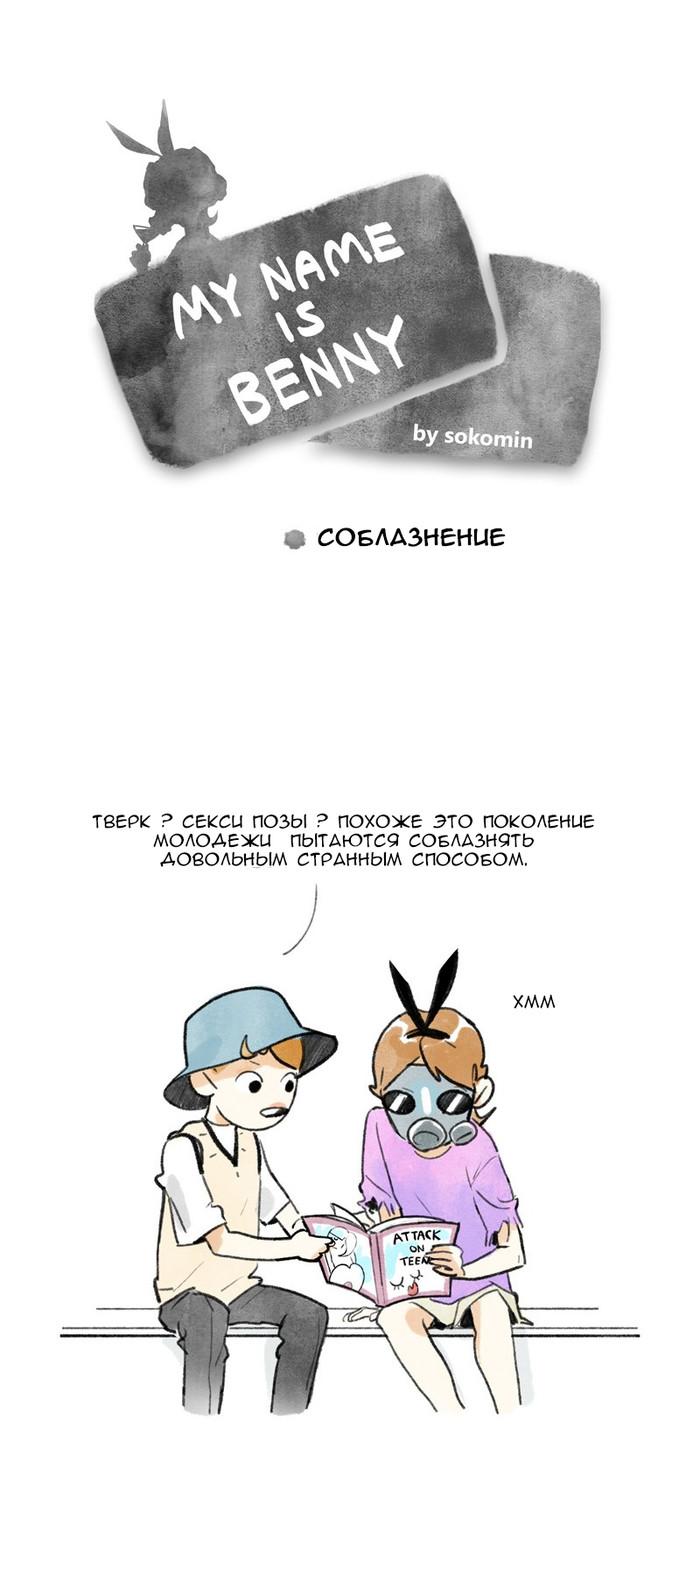 My name is Benny (Ep.38) Mnib, Sokomin, Перевел сам, Комиксы, Длиннопост